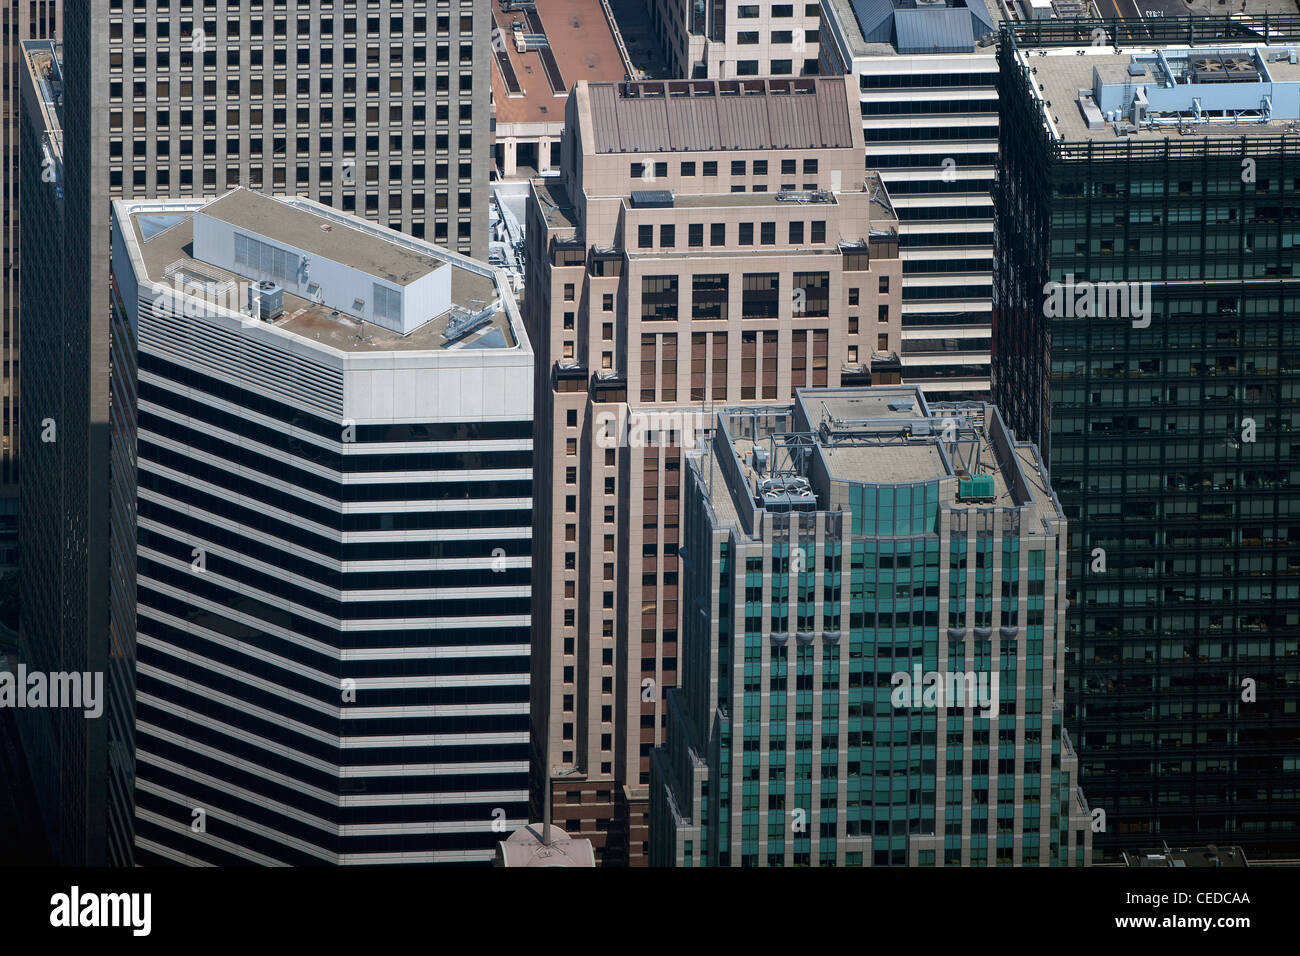 Aerial Photograph 595 Market 55 Second St San Francisco California USA